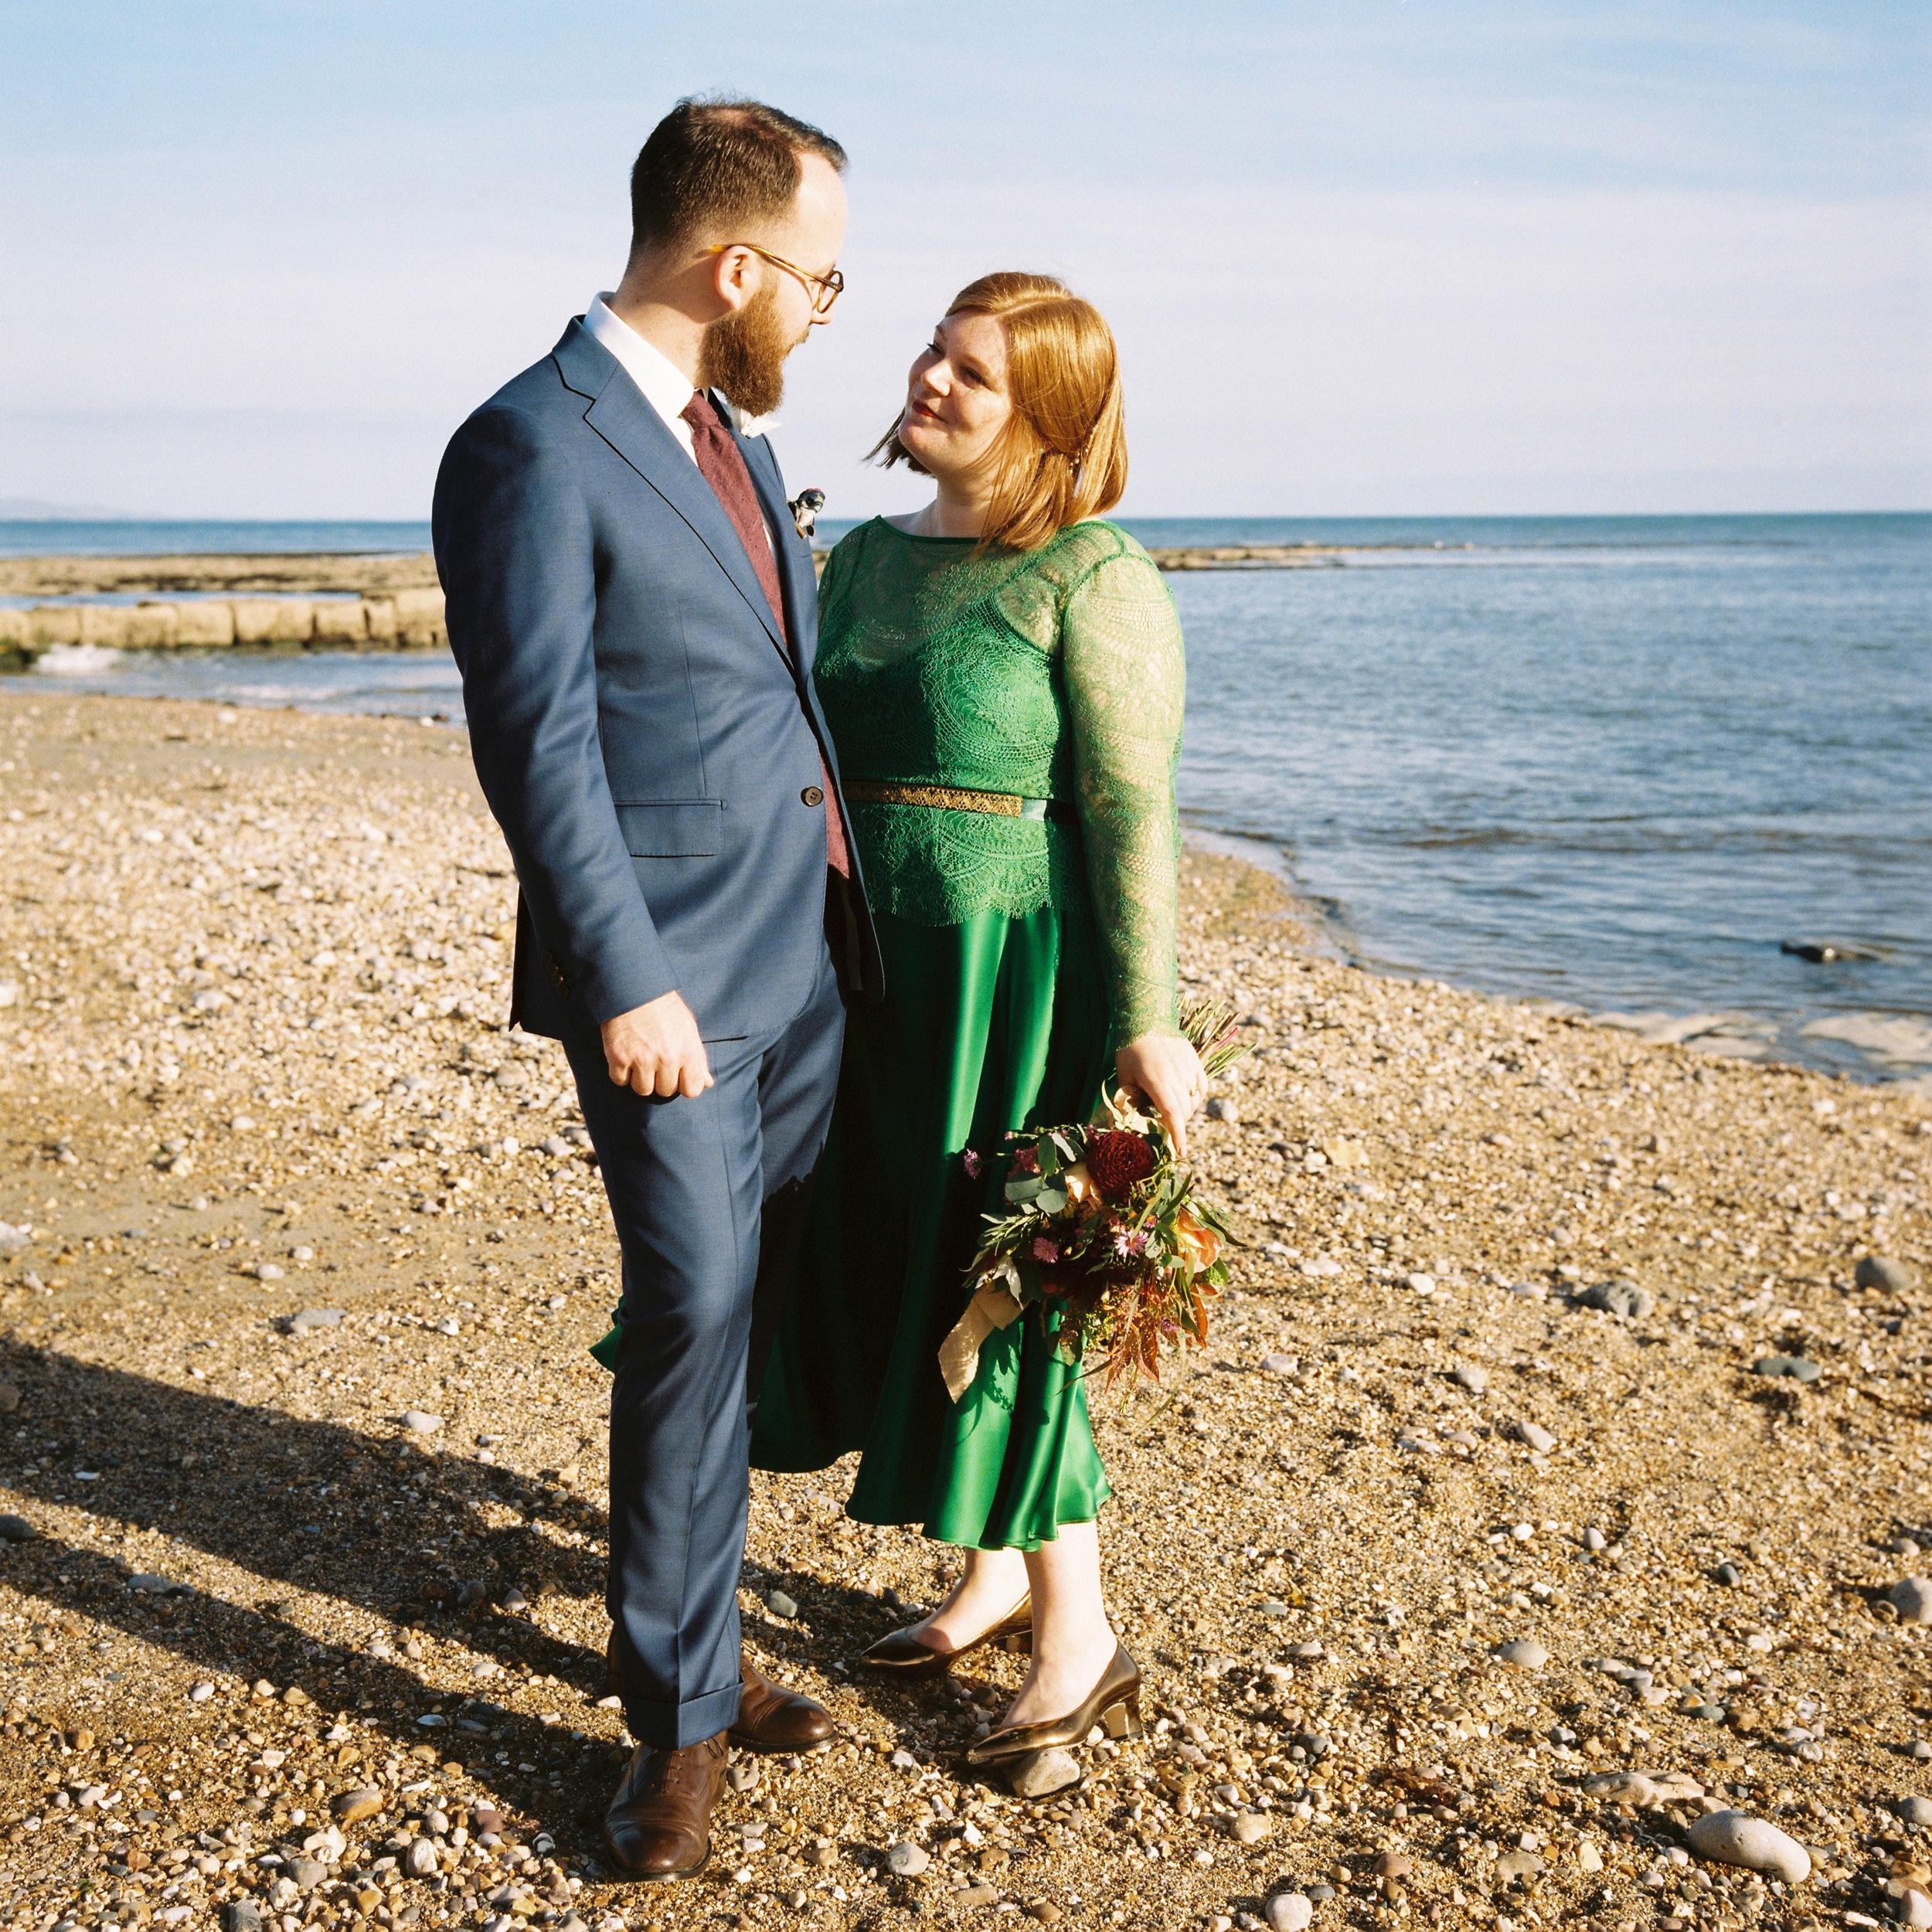 Lucy-Bespoke-Green-Silk-Lace-Wedding-Dress-Kate-Beaumont-Sheffield-6.jpg